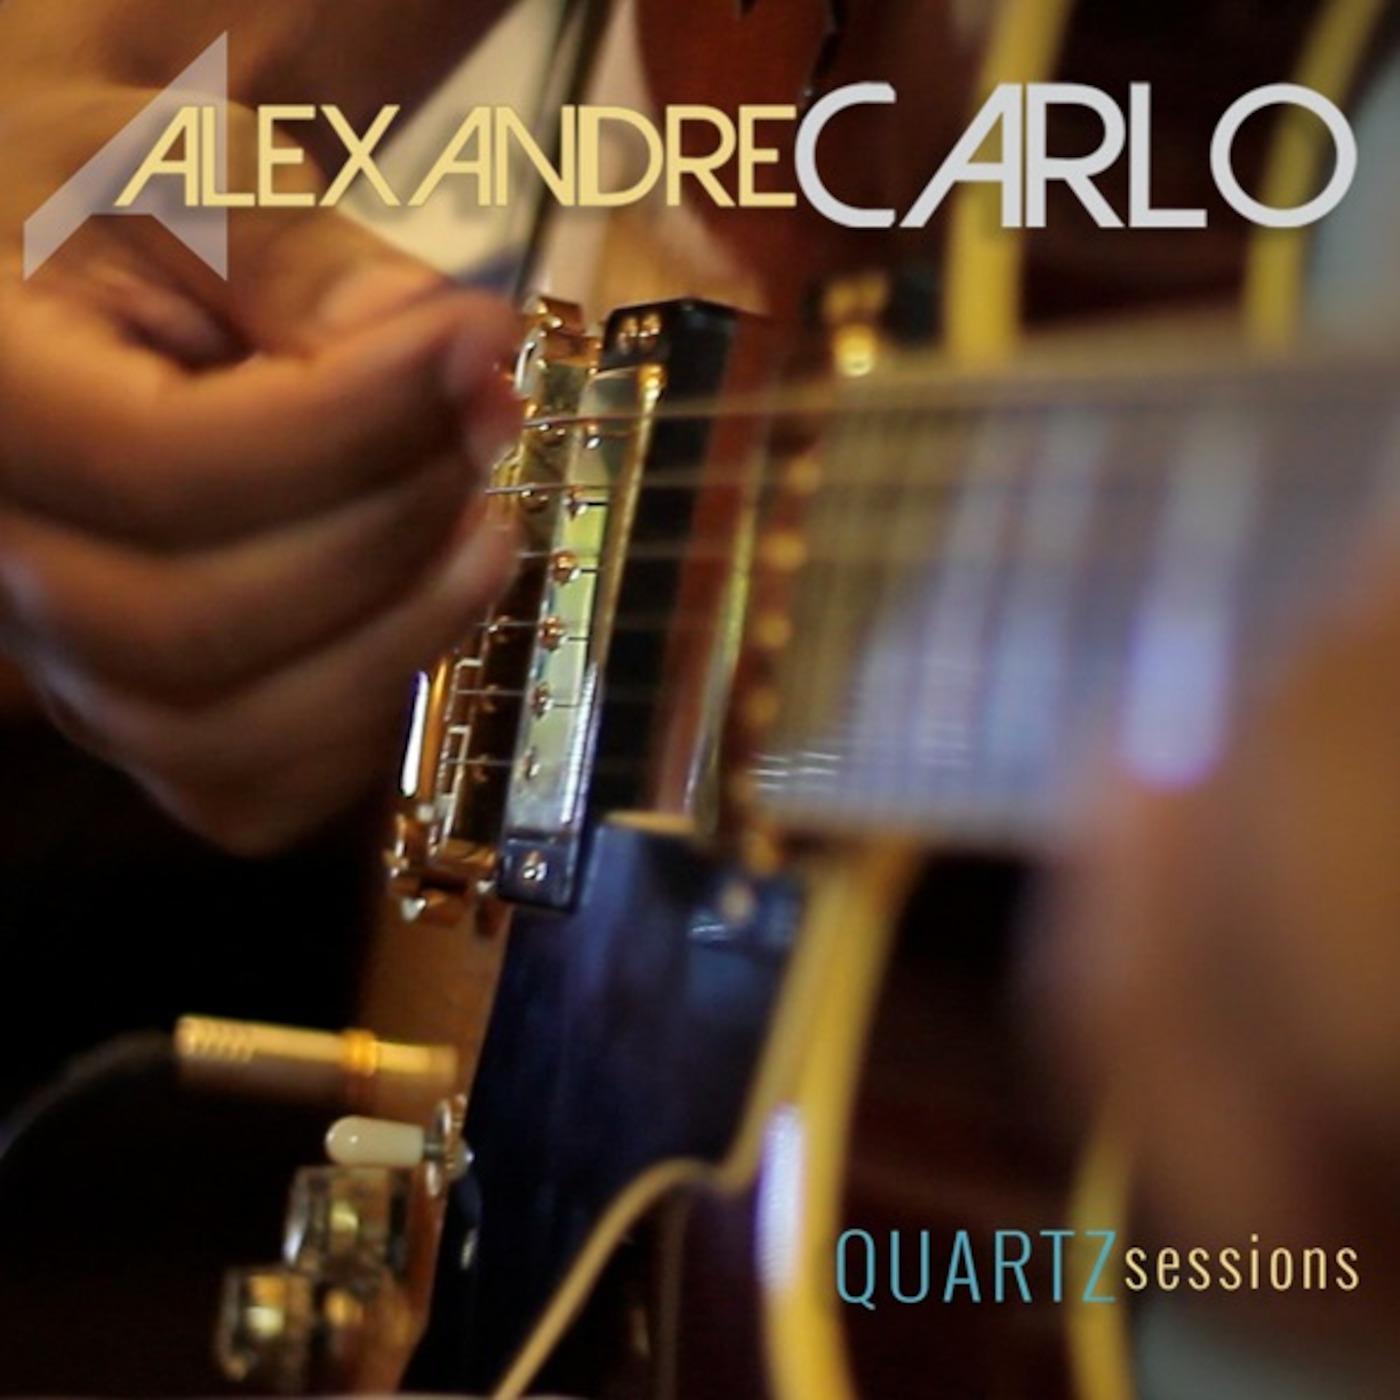 Alexandre Carlo - Podcast Oficial